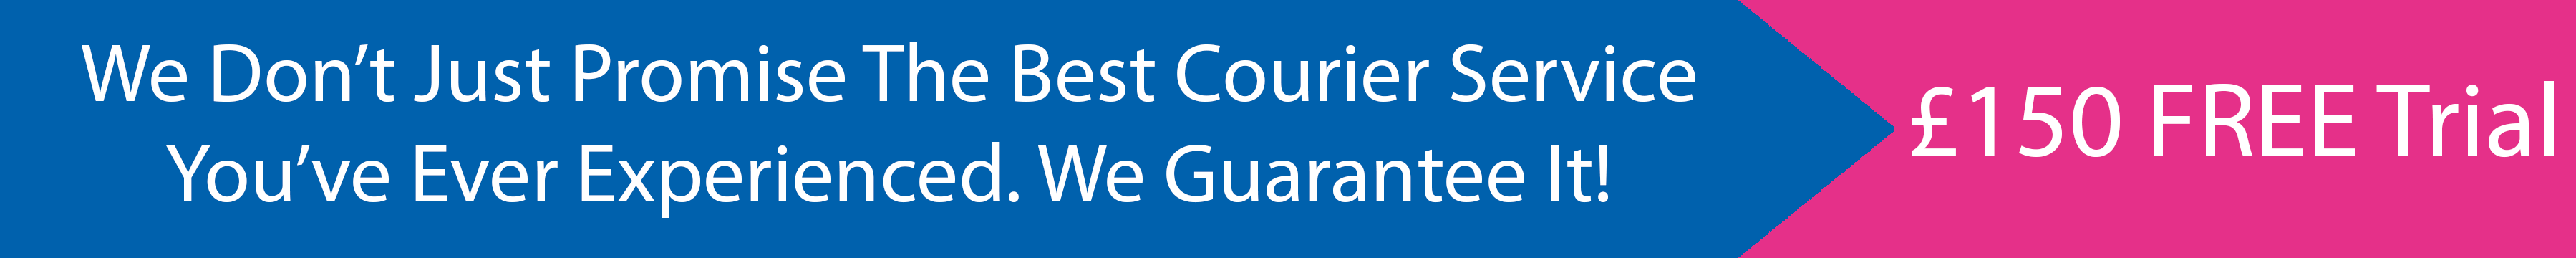 Voucher Grabbit and Run Couriers